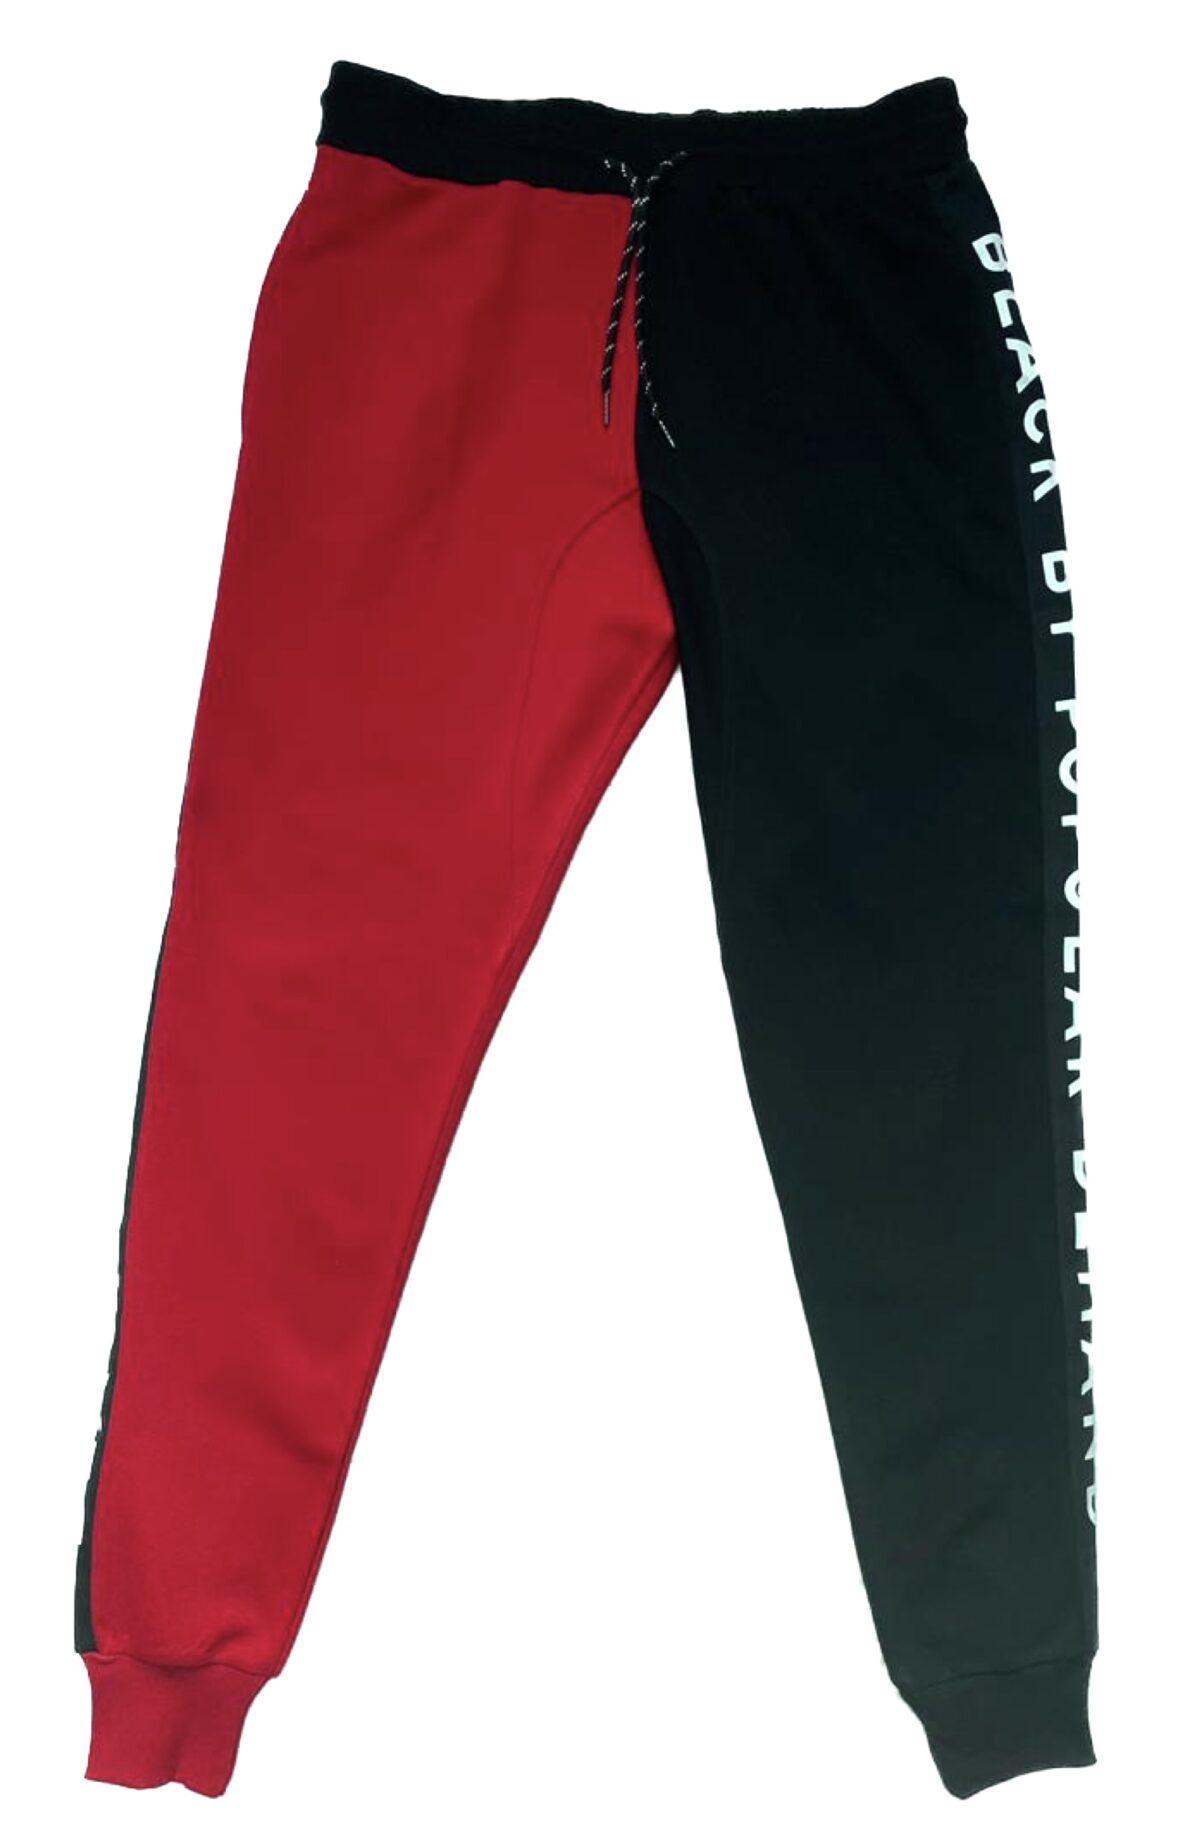 Black by Popular Demand® Unisex Black & Red Joggers Sweatpants HGC Apparel